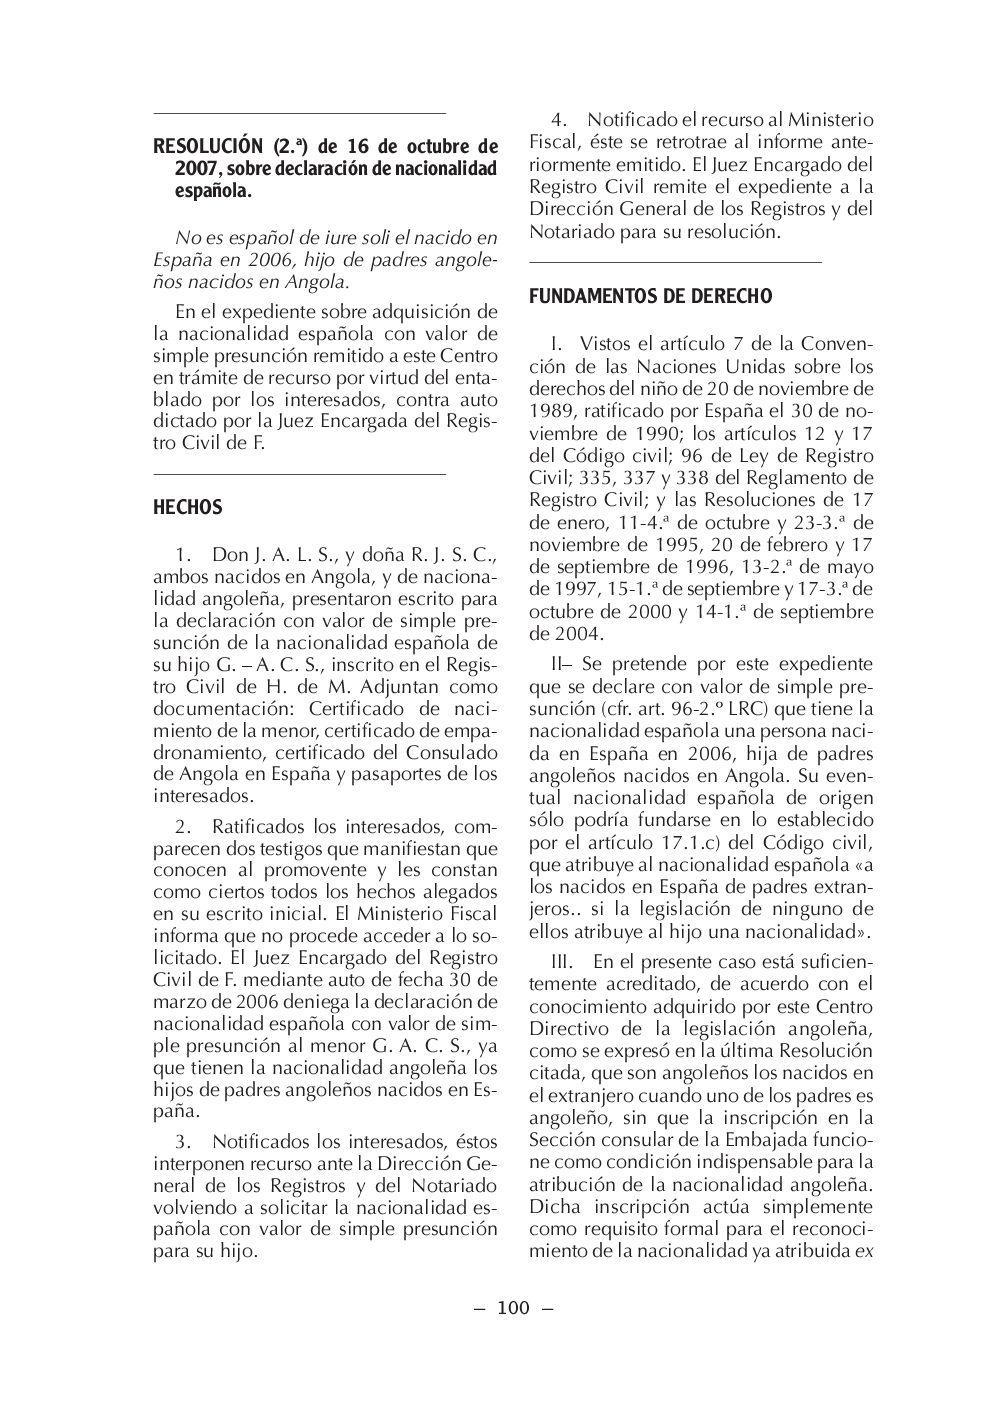 2008-05-15 (2). Resoluciones de la DGRN by Xaime Meilán - issuu